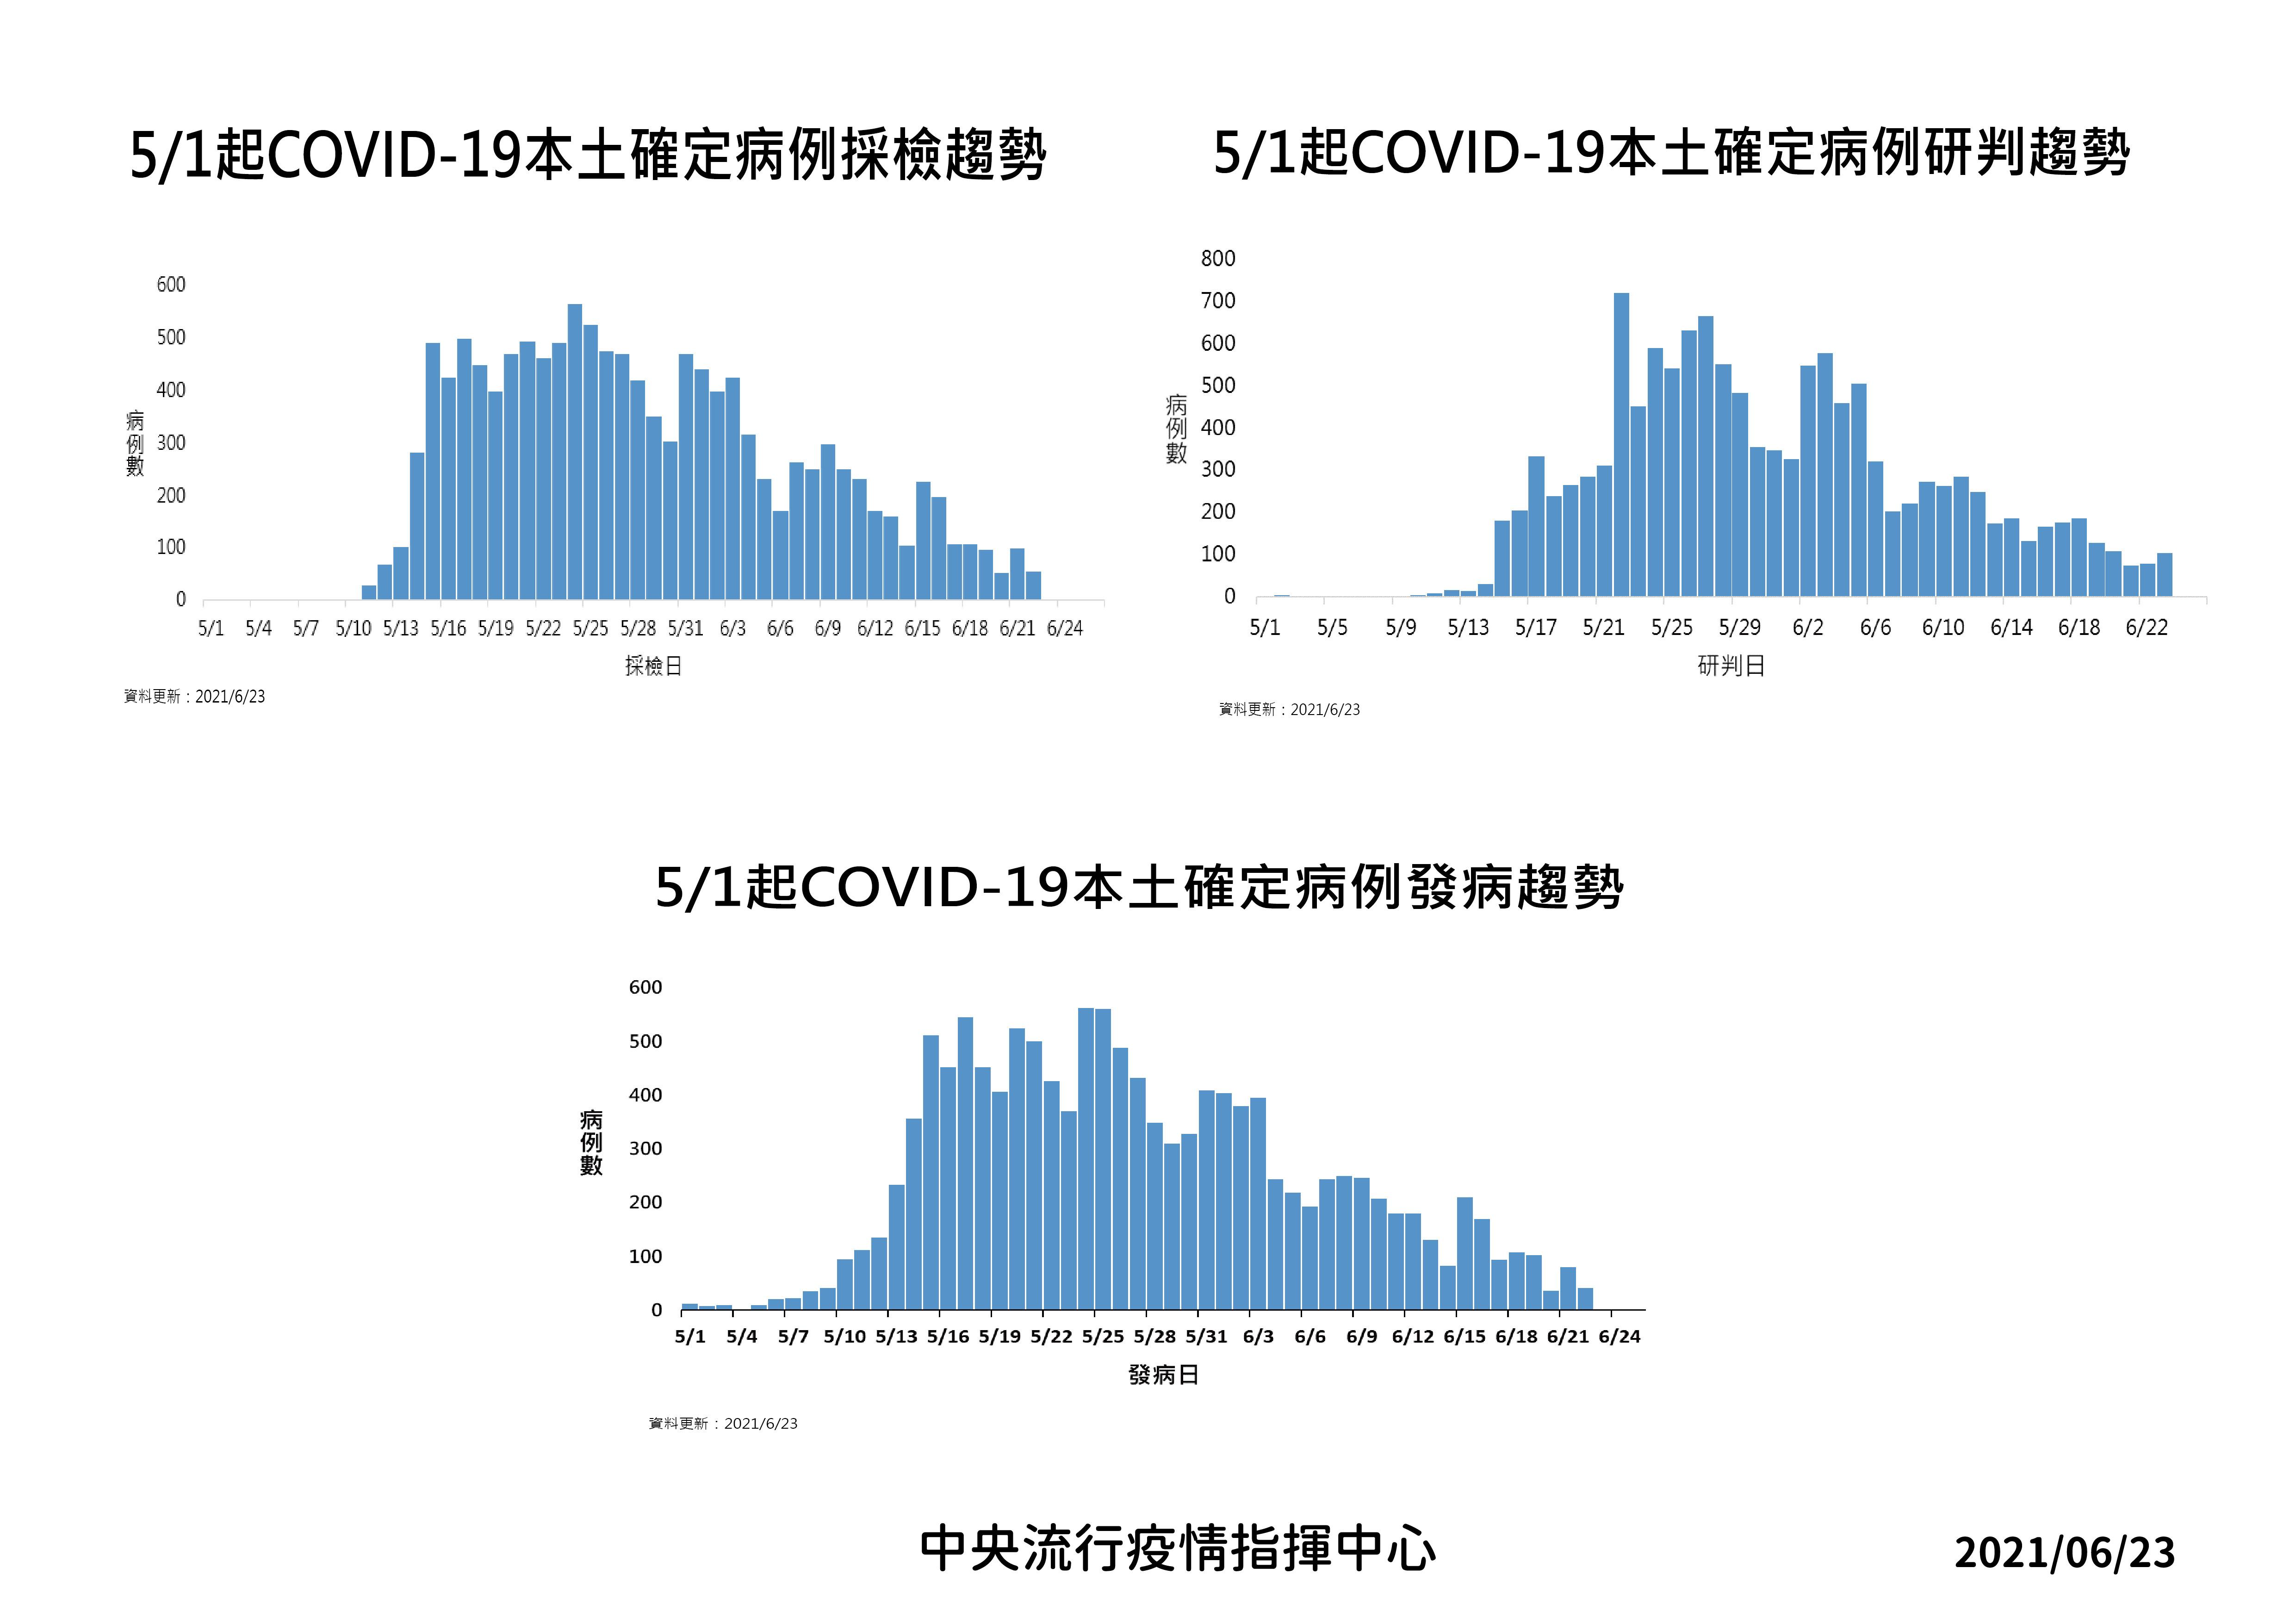 COVID-19,疫苗,防疫,確診,致死率,CT值,防疫新生活,指揮中心,陳時中